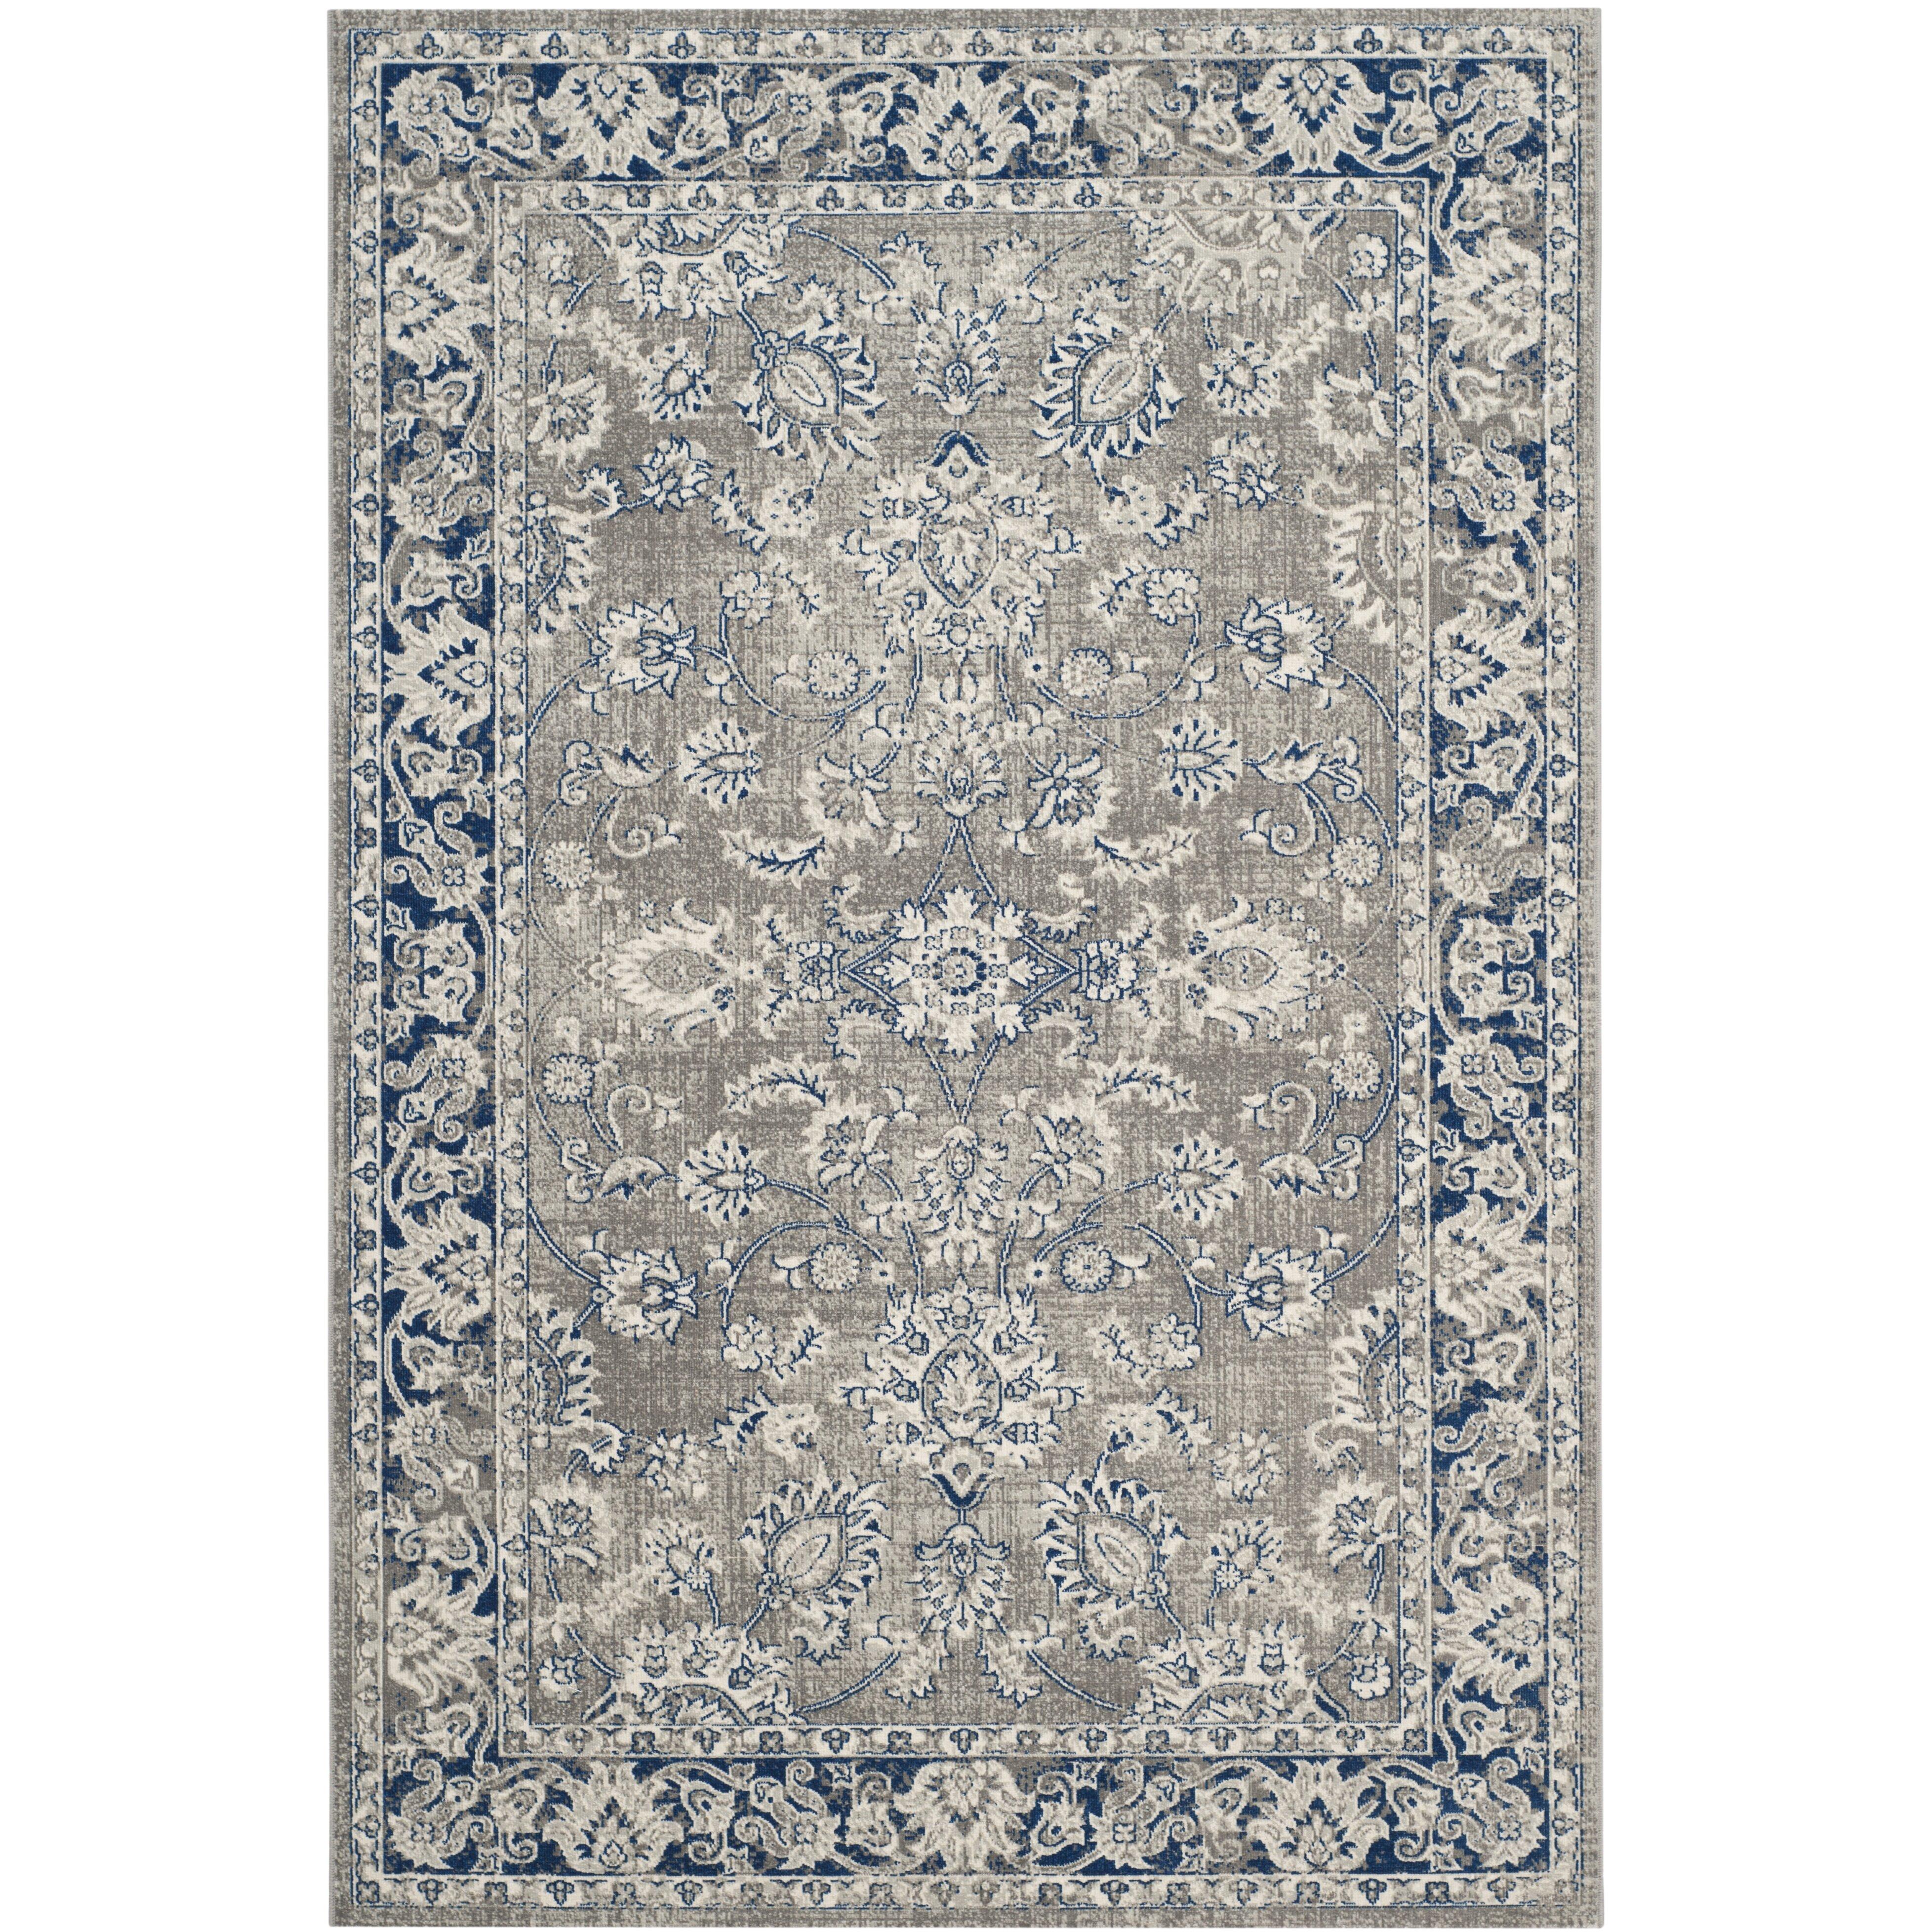 darby home co harwood gray blue area rug reviews wayfair. Black Bedroom Furniture Sets. Home Design Ideas